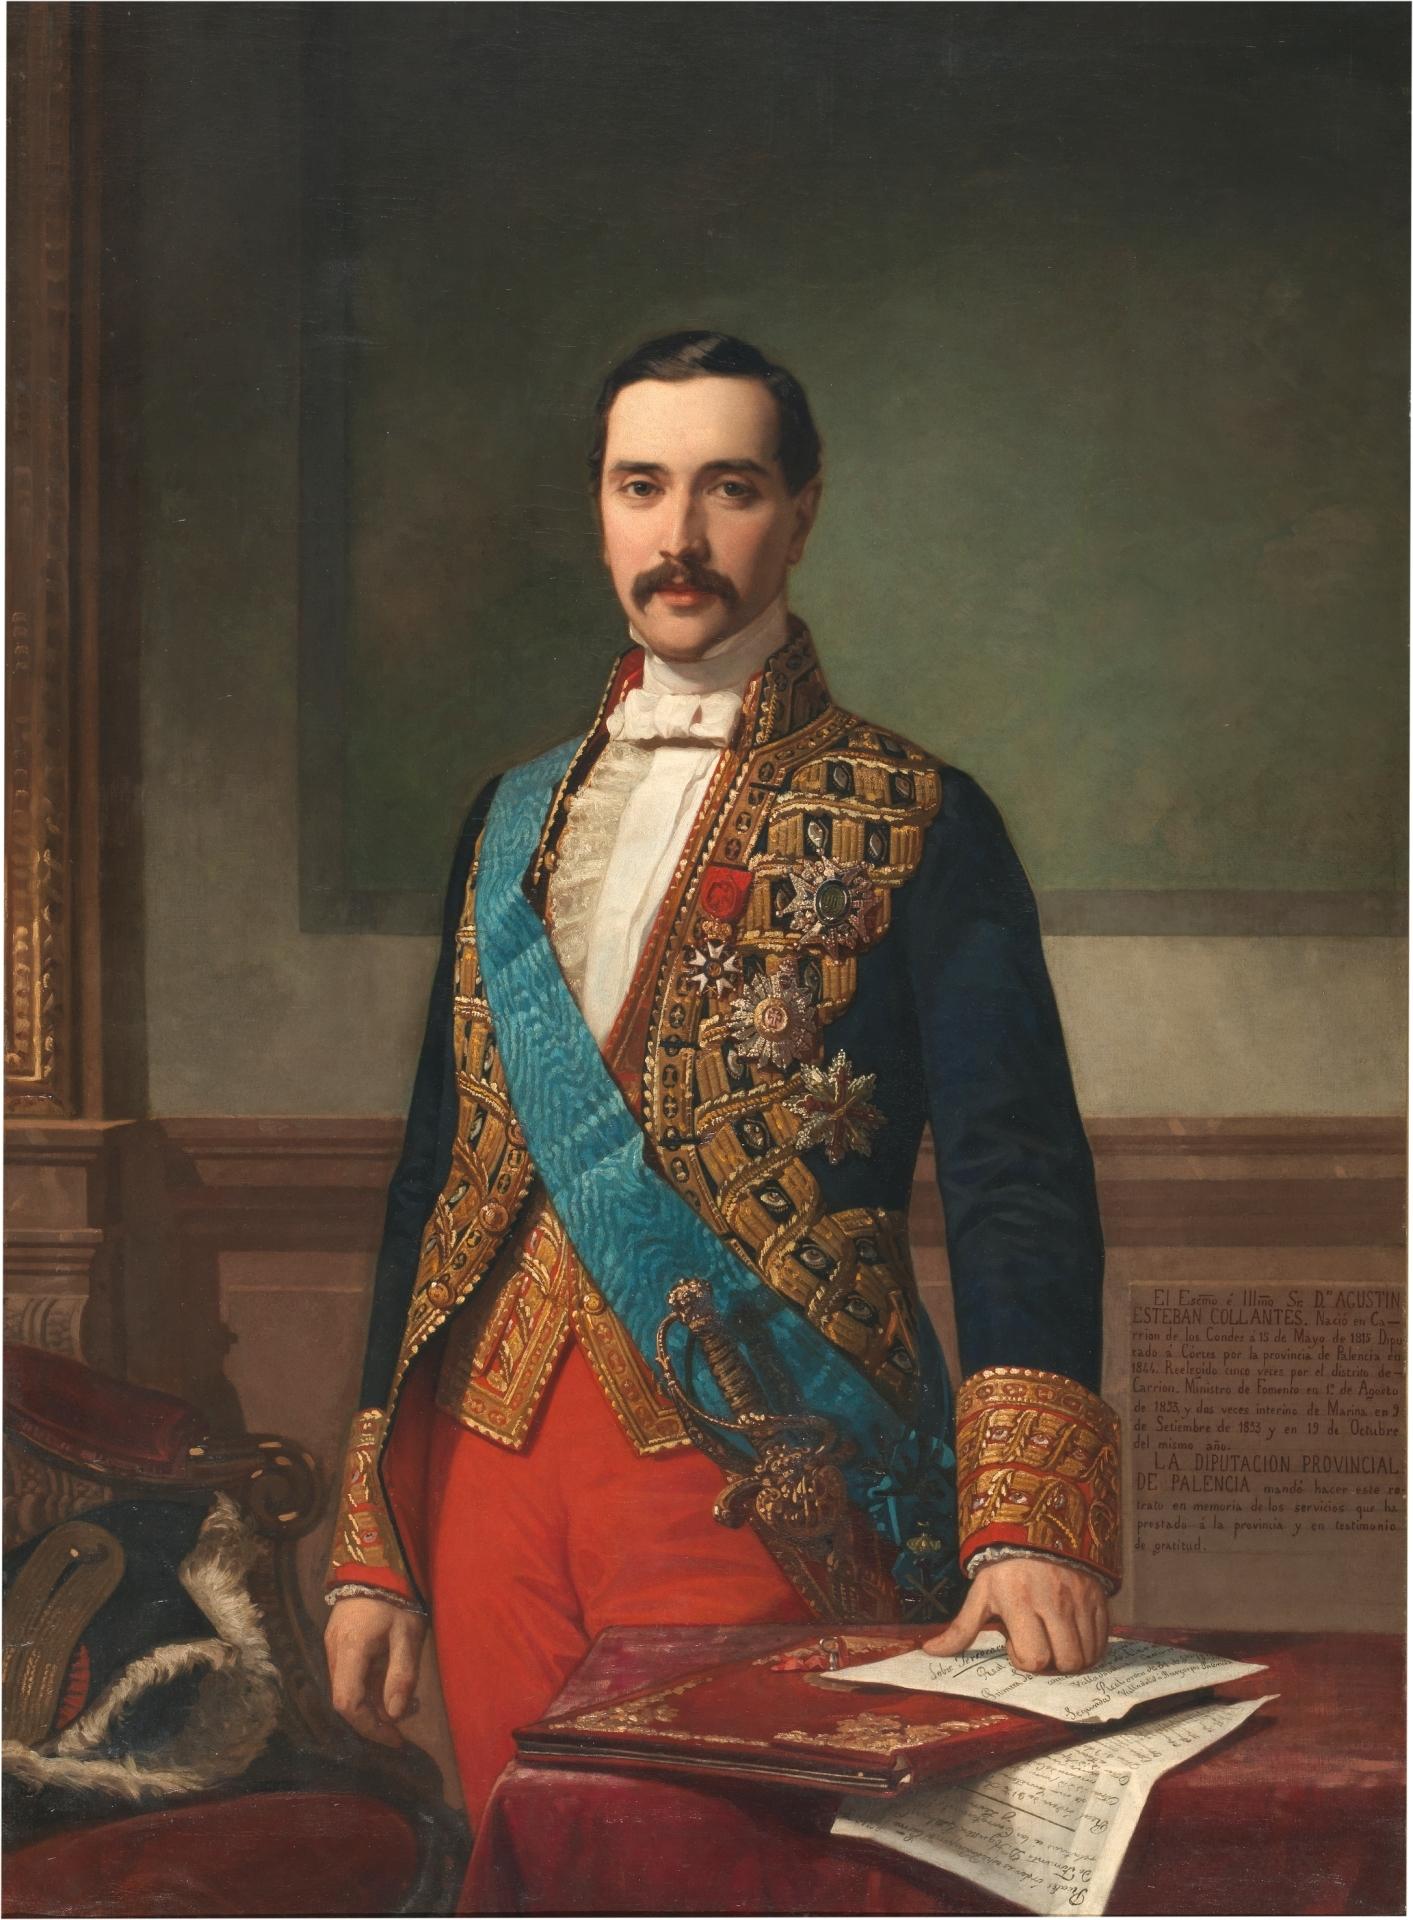 https://upload.wikimedia.org/wikipedia/commons/8/8e/Agust%C3%ADn_Esteban_Collantes_%28Museo_del_Prado%29.jpg